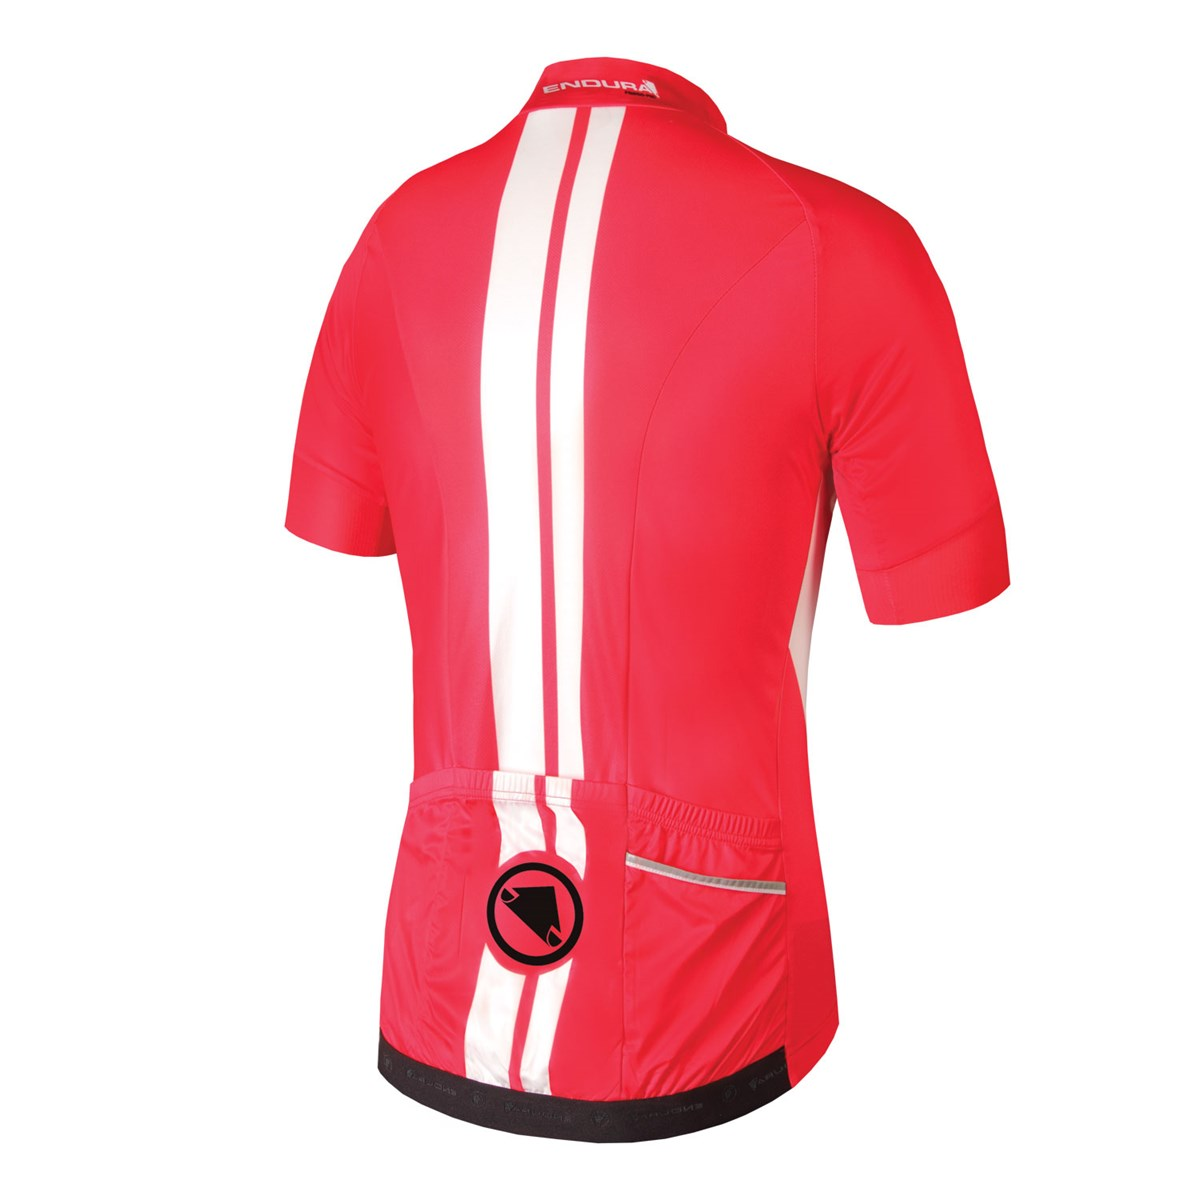 Endura FS260-Pro Jetstream Red Short Sleeve Cycling Jersey £77.99 6d9dc6b60